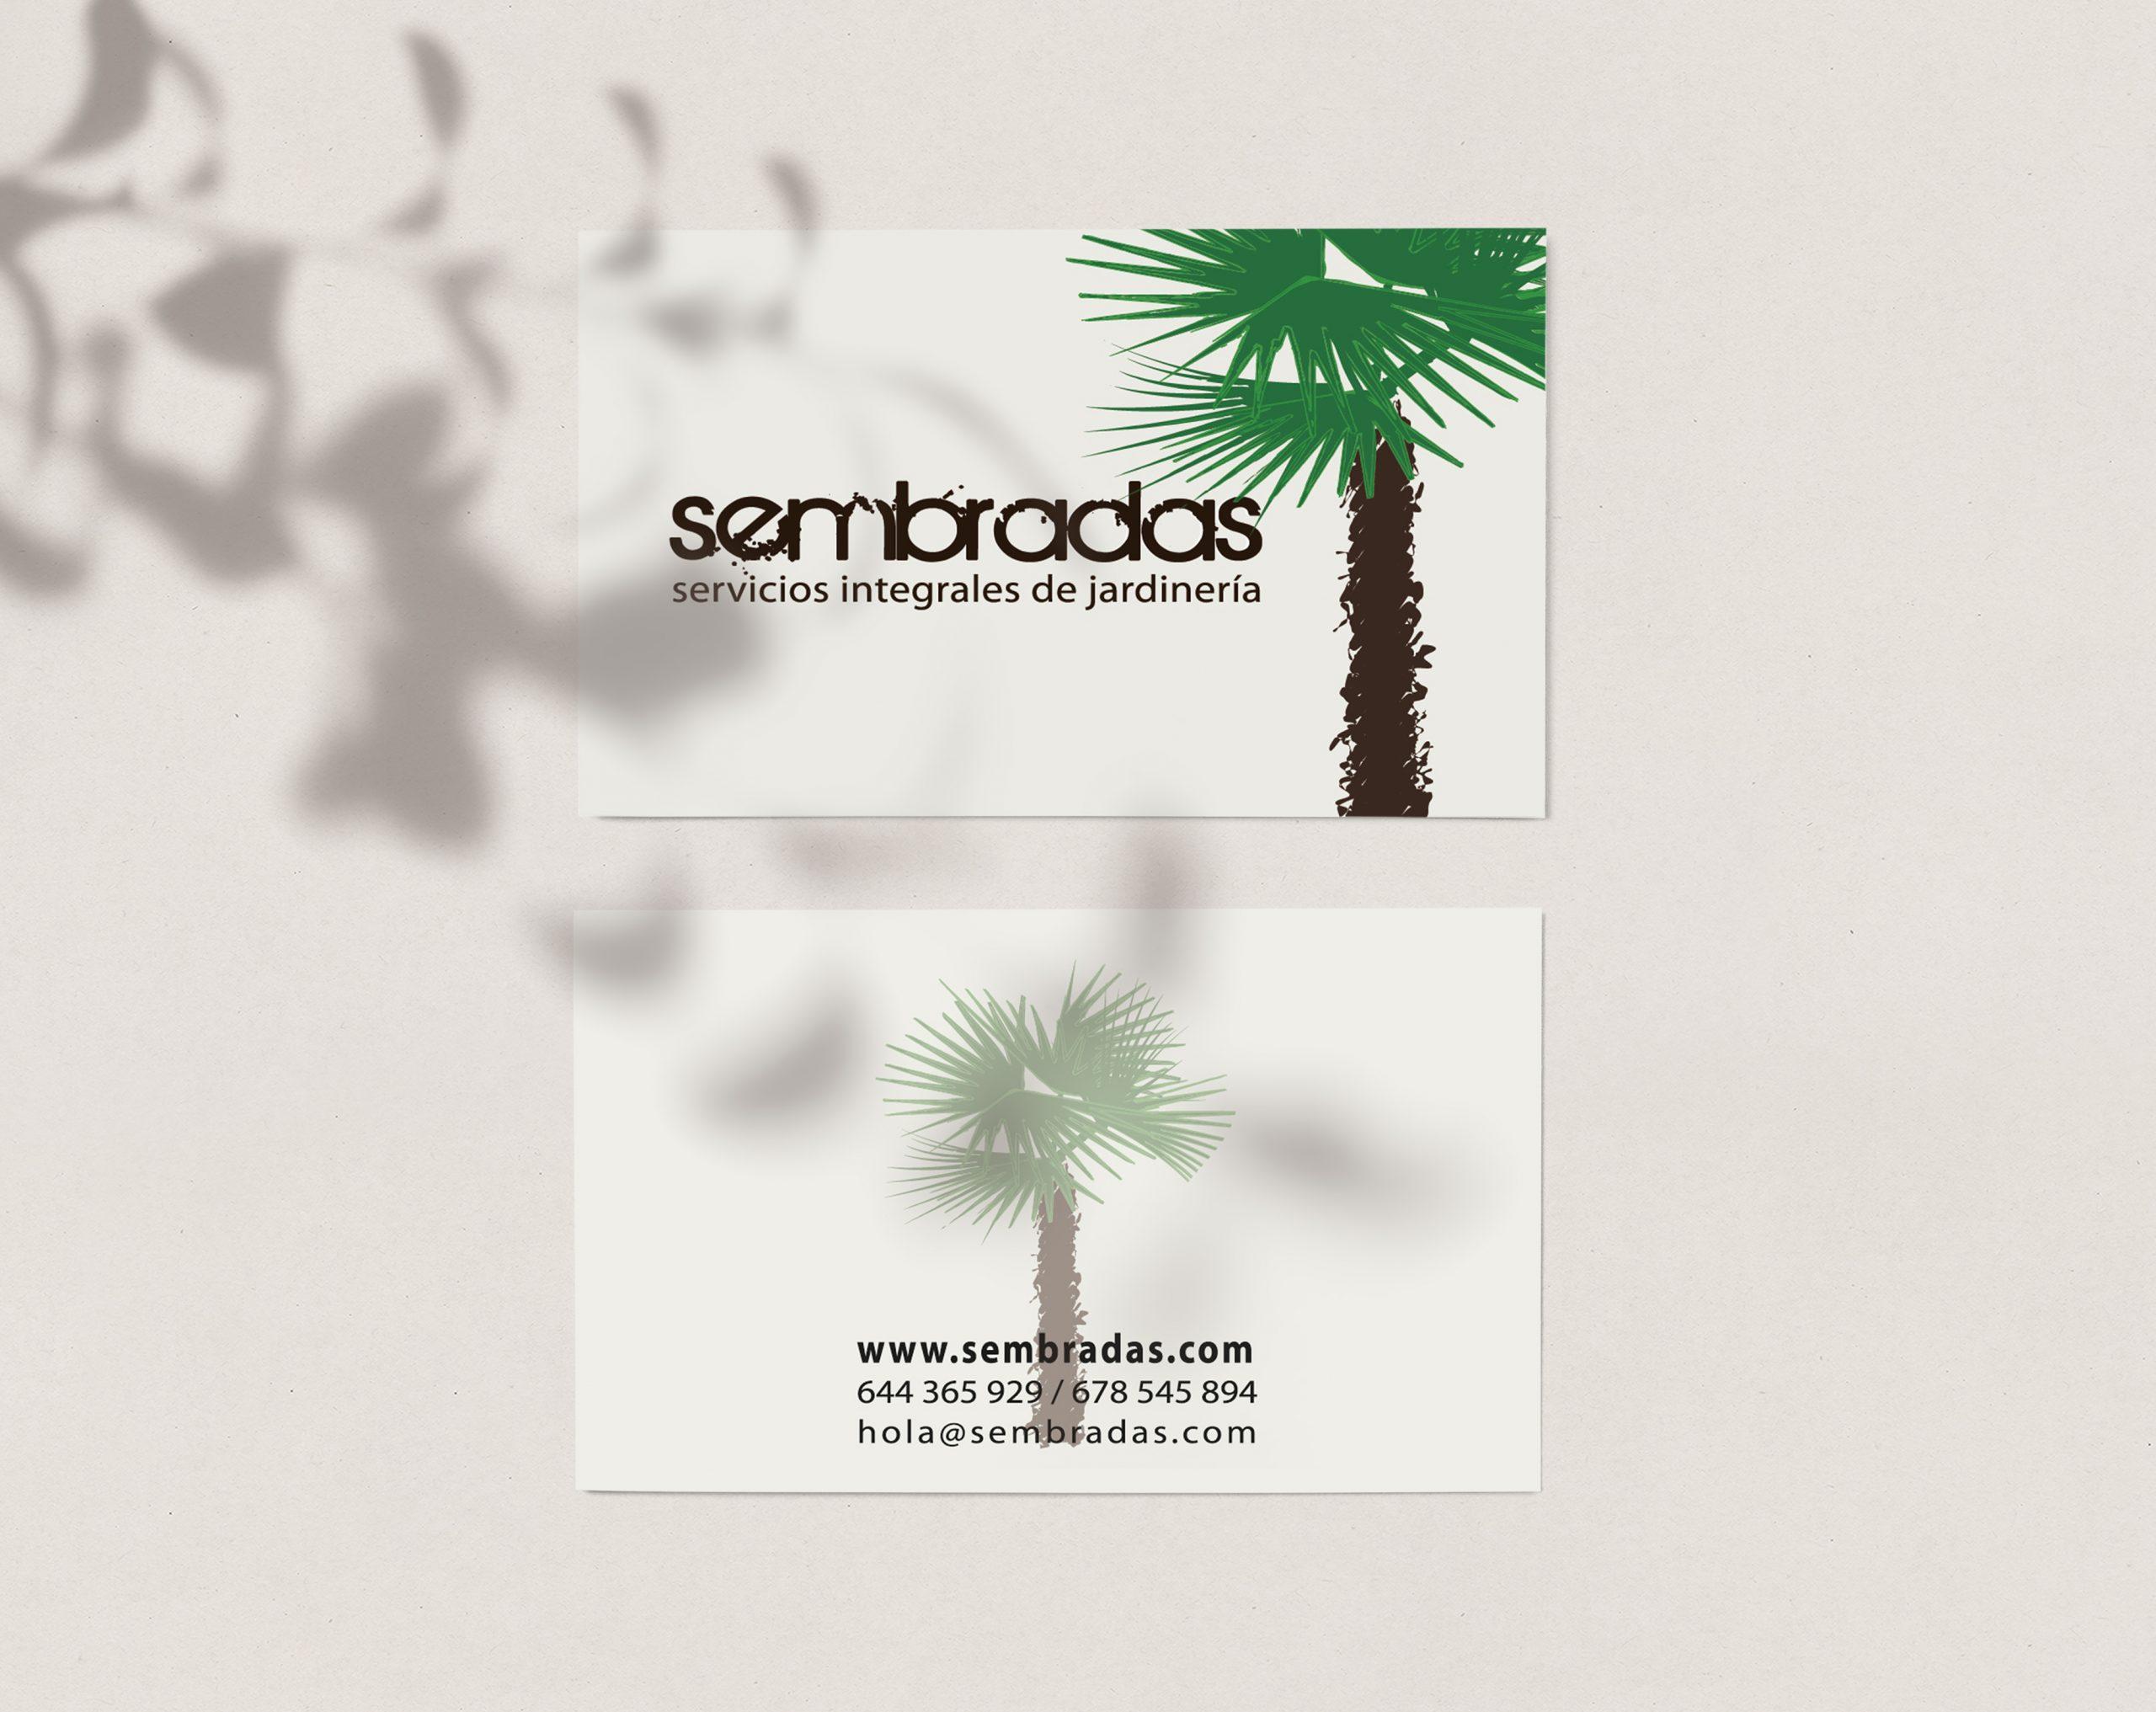 Logotipo para empresa de jardineria en Sevilla, Sembradas, by DSMK